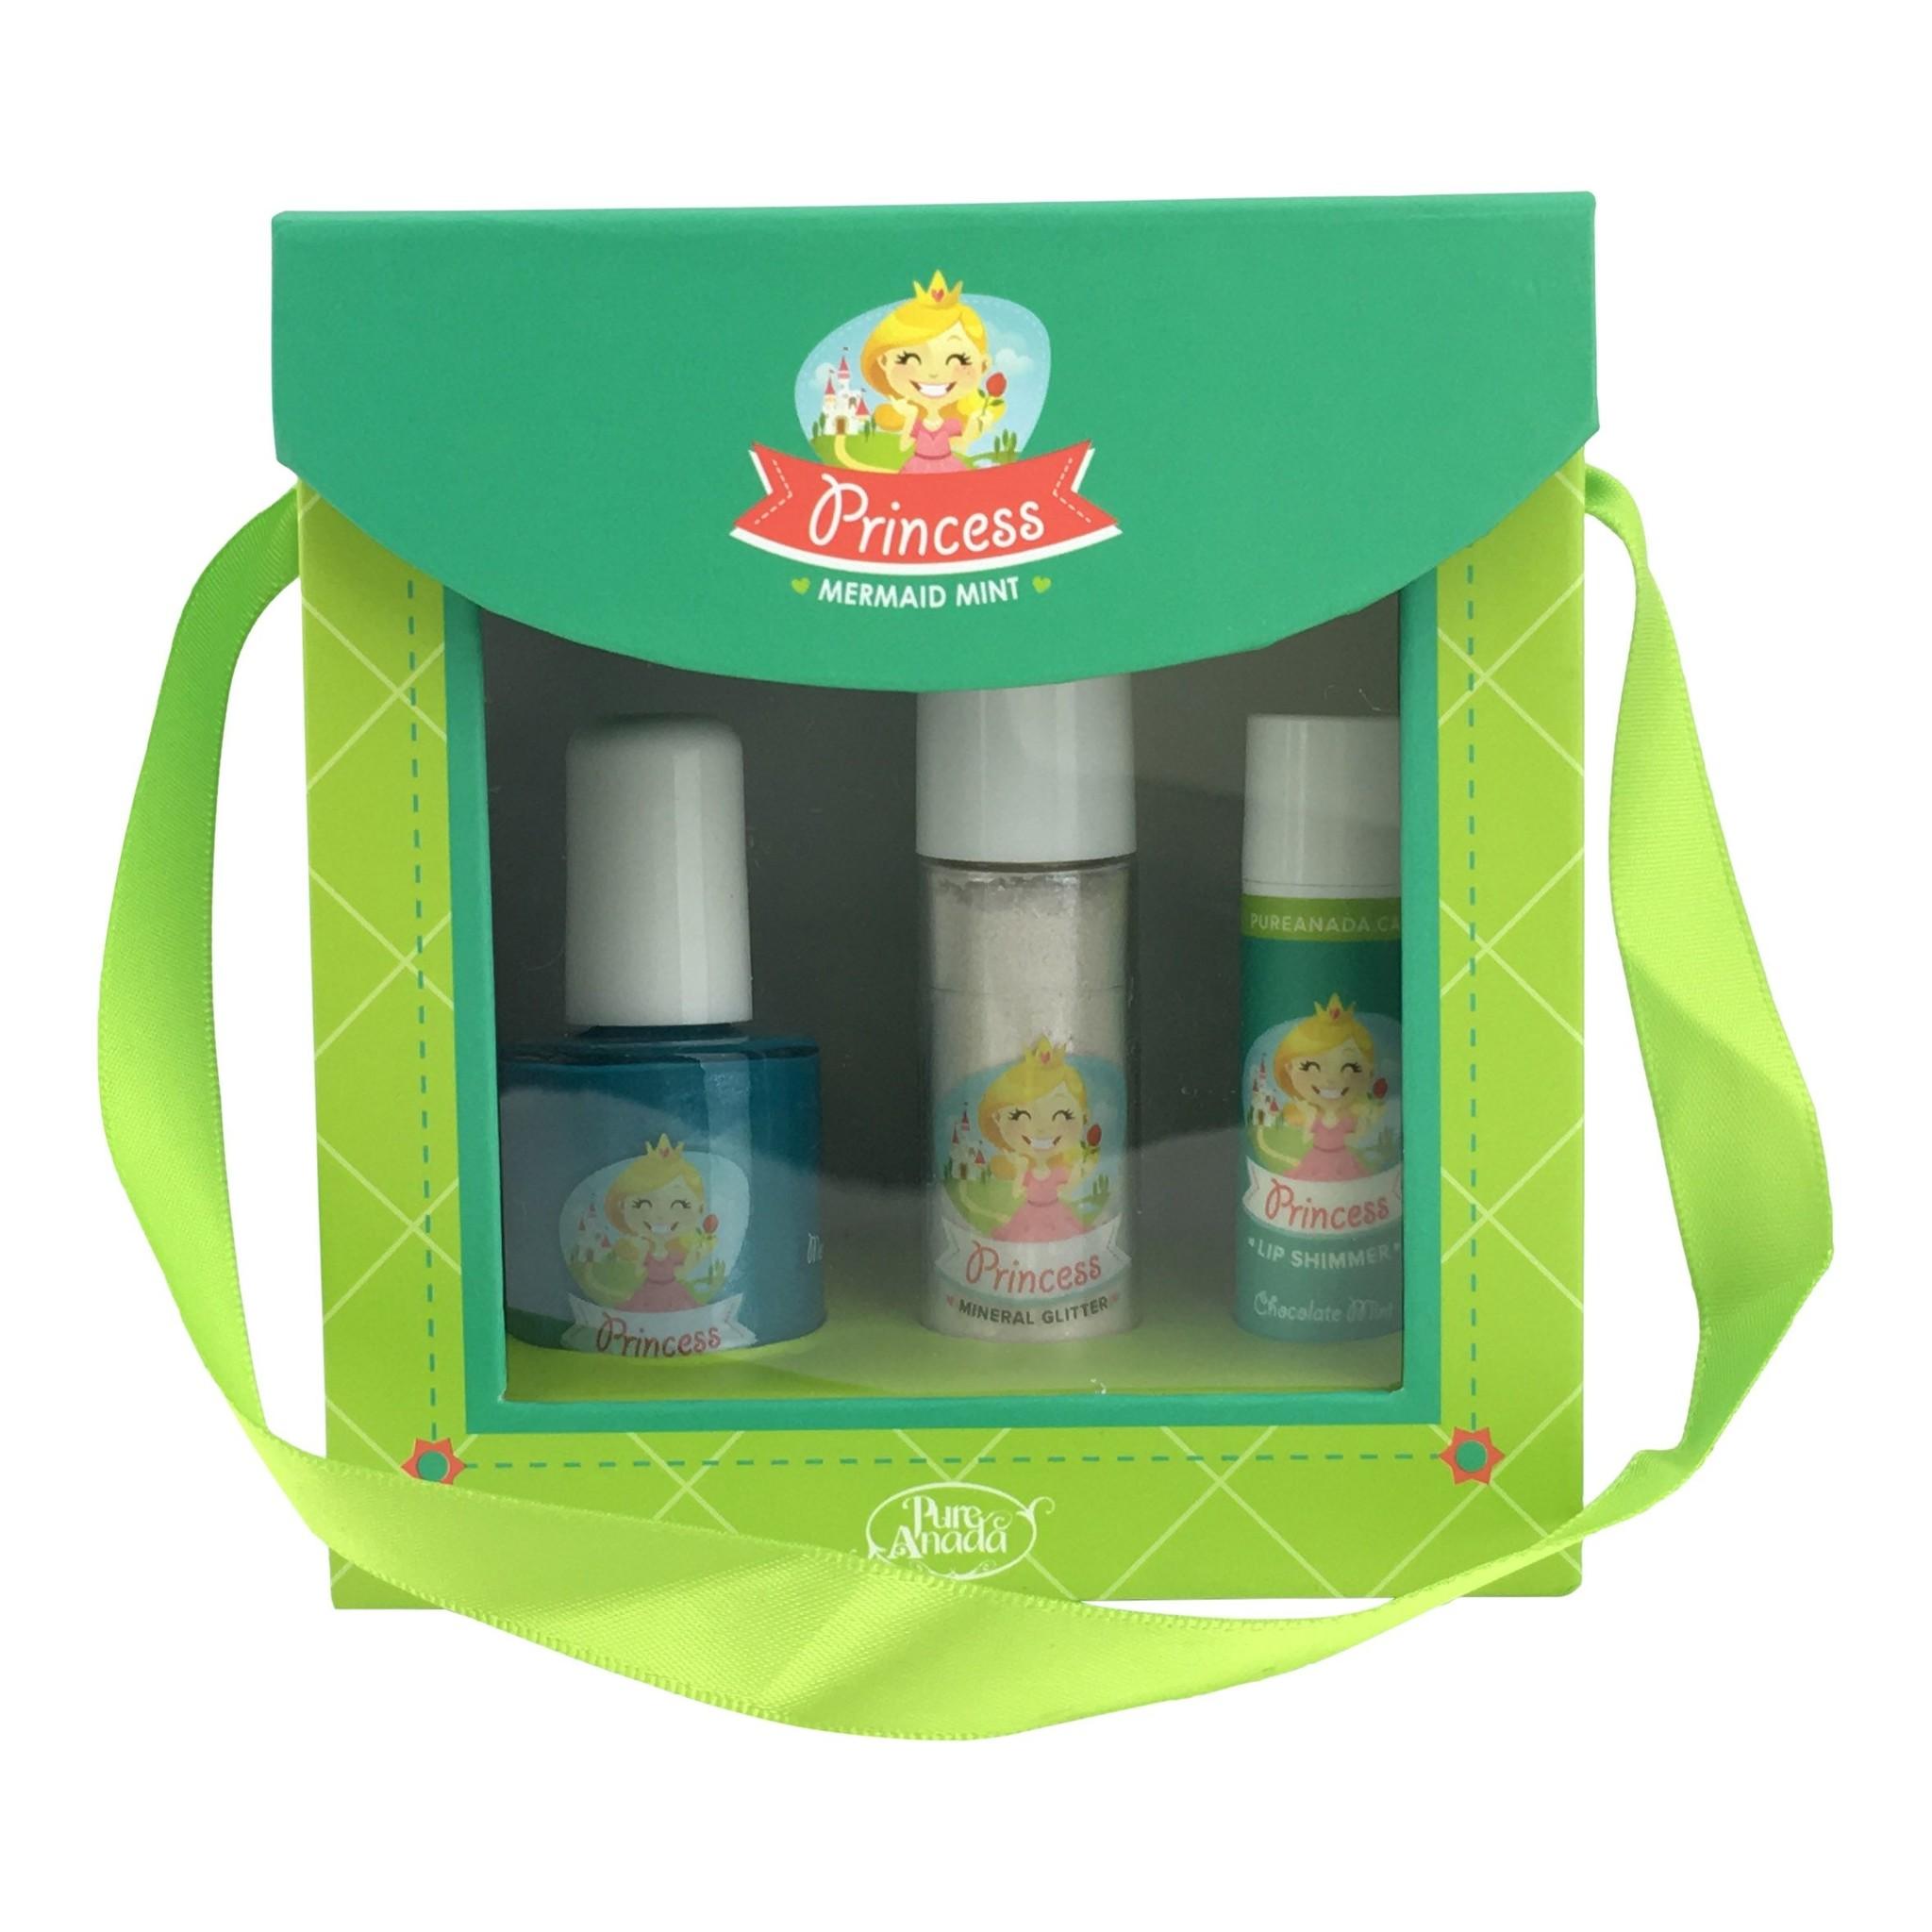 Princess Pack - Mermaid Mint-1